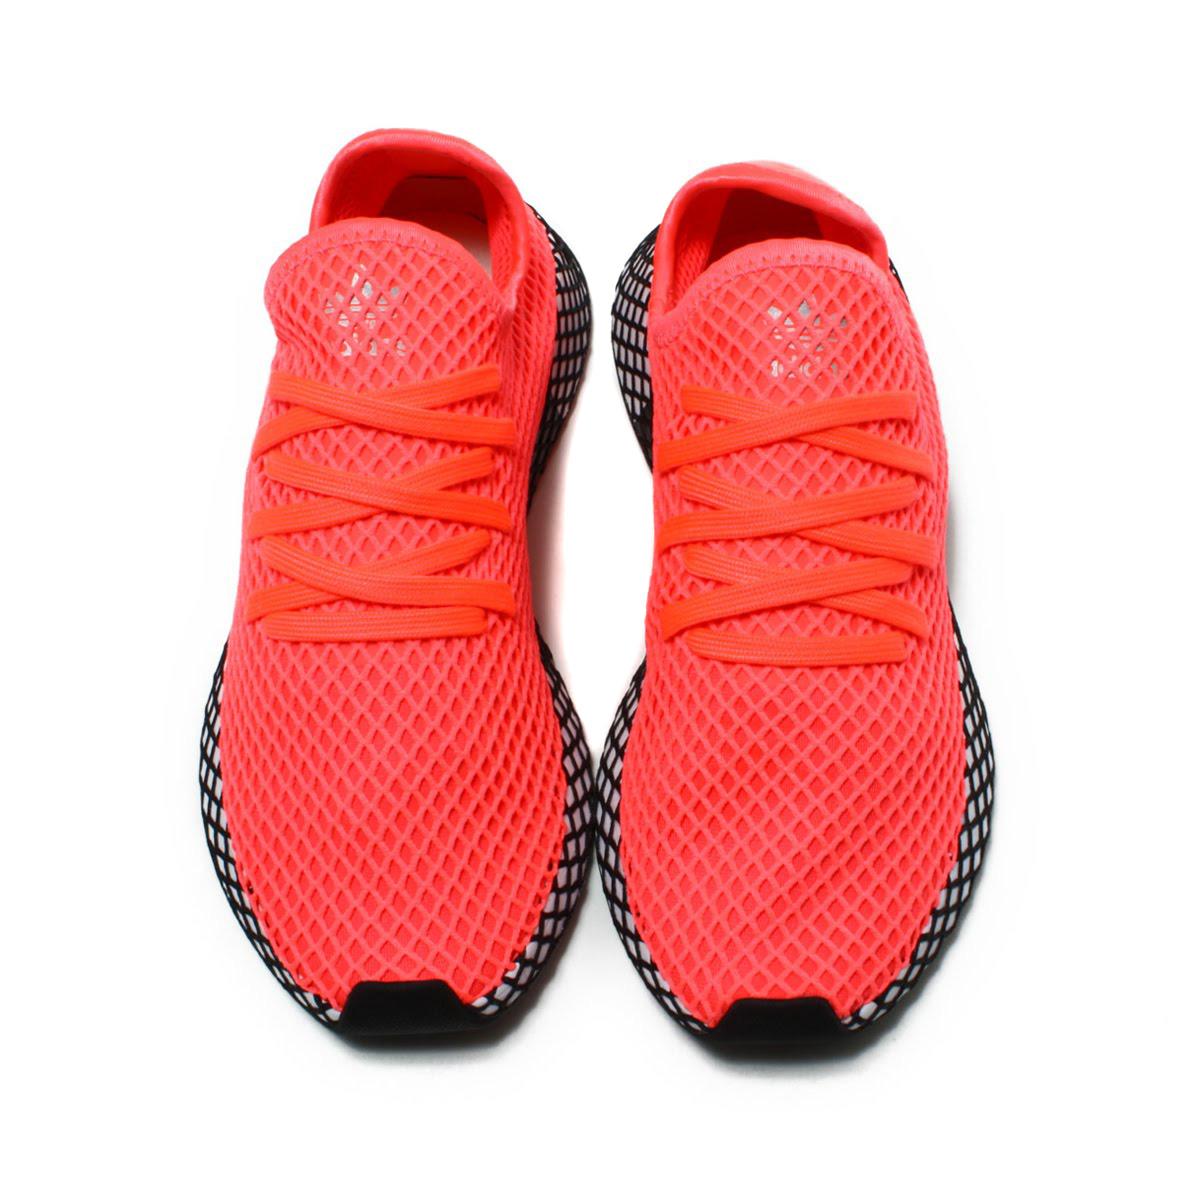 cheaper ec5fa 3dec5 adidas Originals DEERUPT RUNNER (アディダスオリジナルスディラプトランナー) TURBOTURBOCORE  BLACK 18FA-I